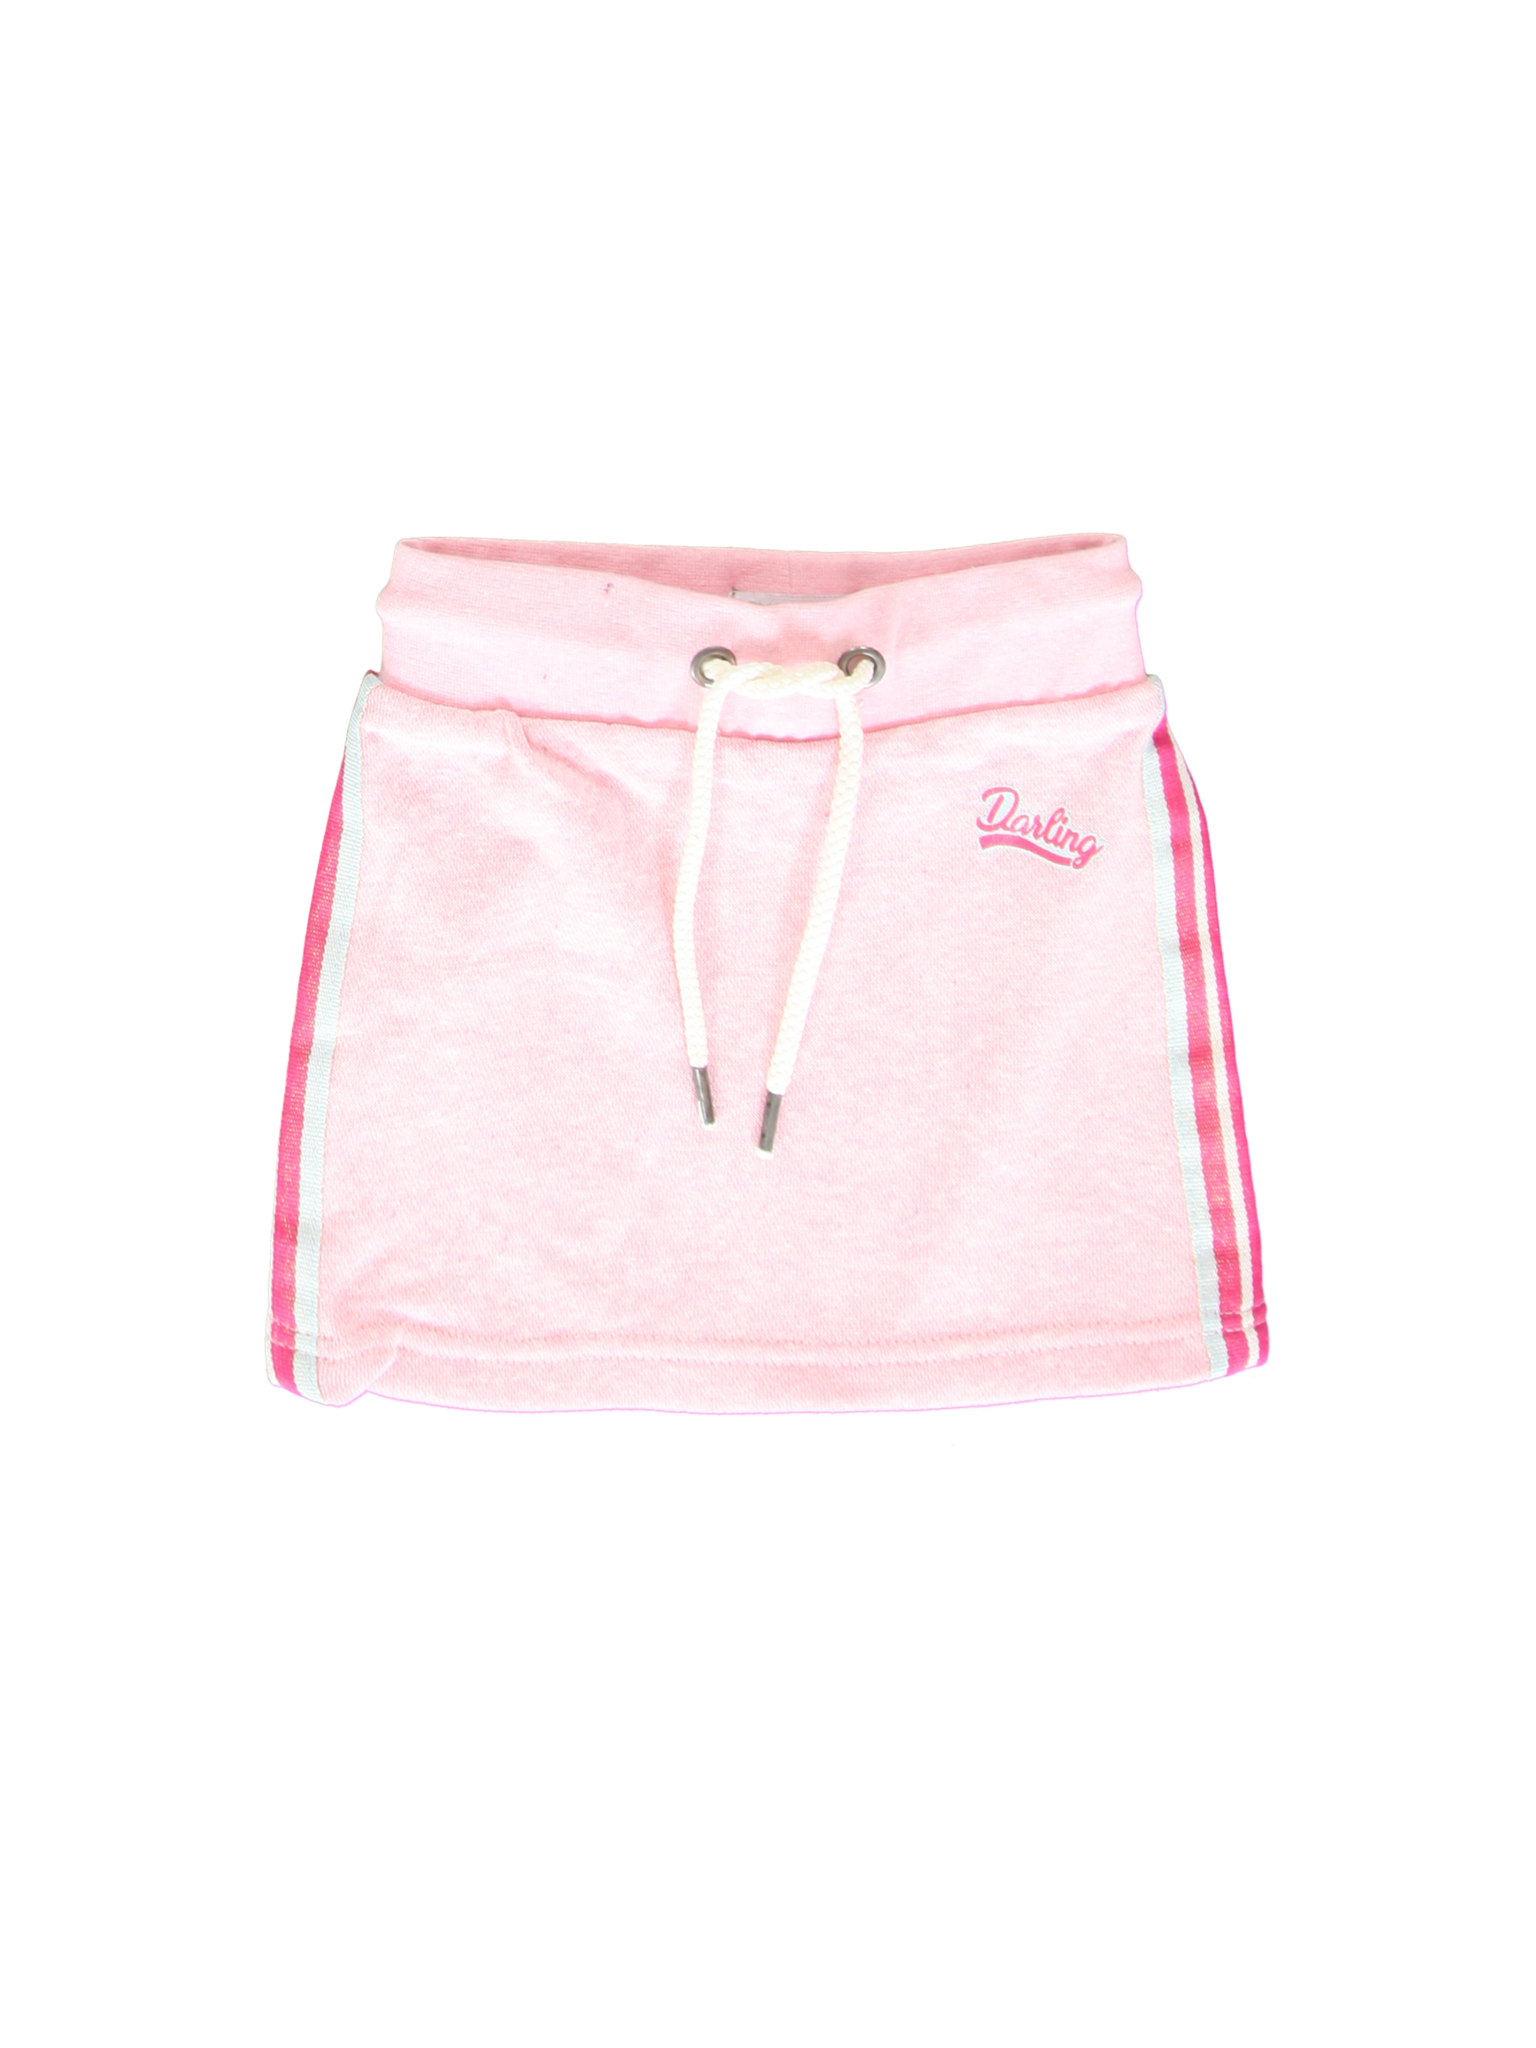 All Brands | Summerproducts Small Girls | Skirt | 10 pcs/box